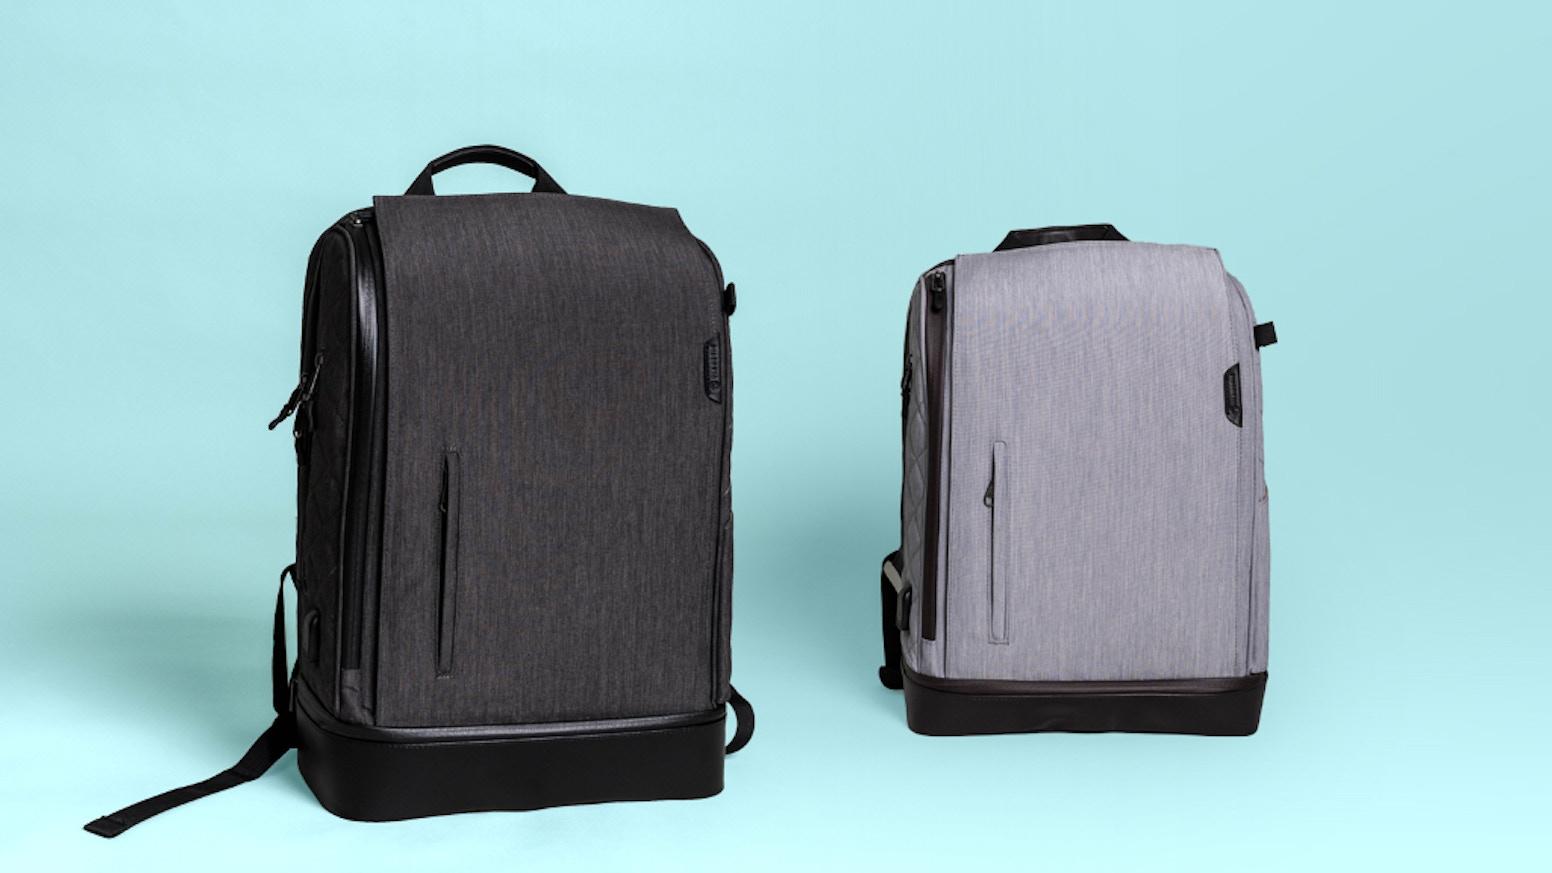 3b860704d61c95 The World's Smartest Diaper Bag Backpack. 5-in-1 Diaper bag makes parenting  easier! No public restrooms? No